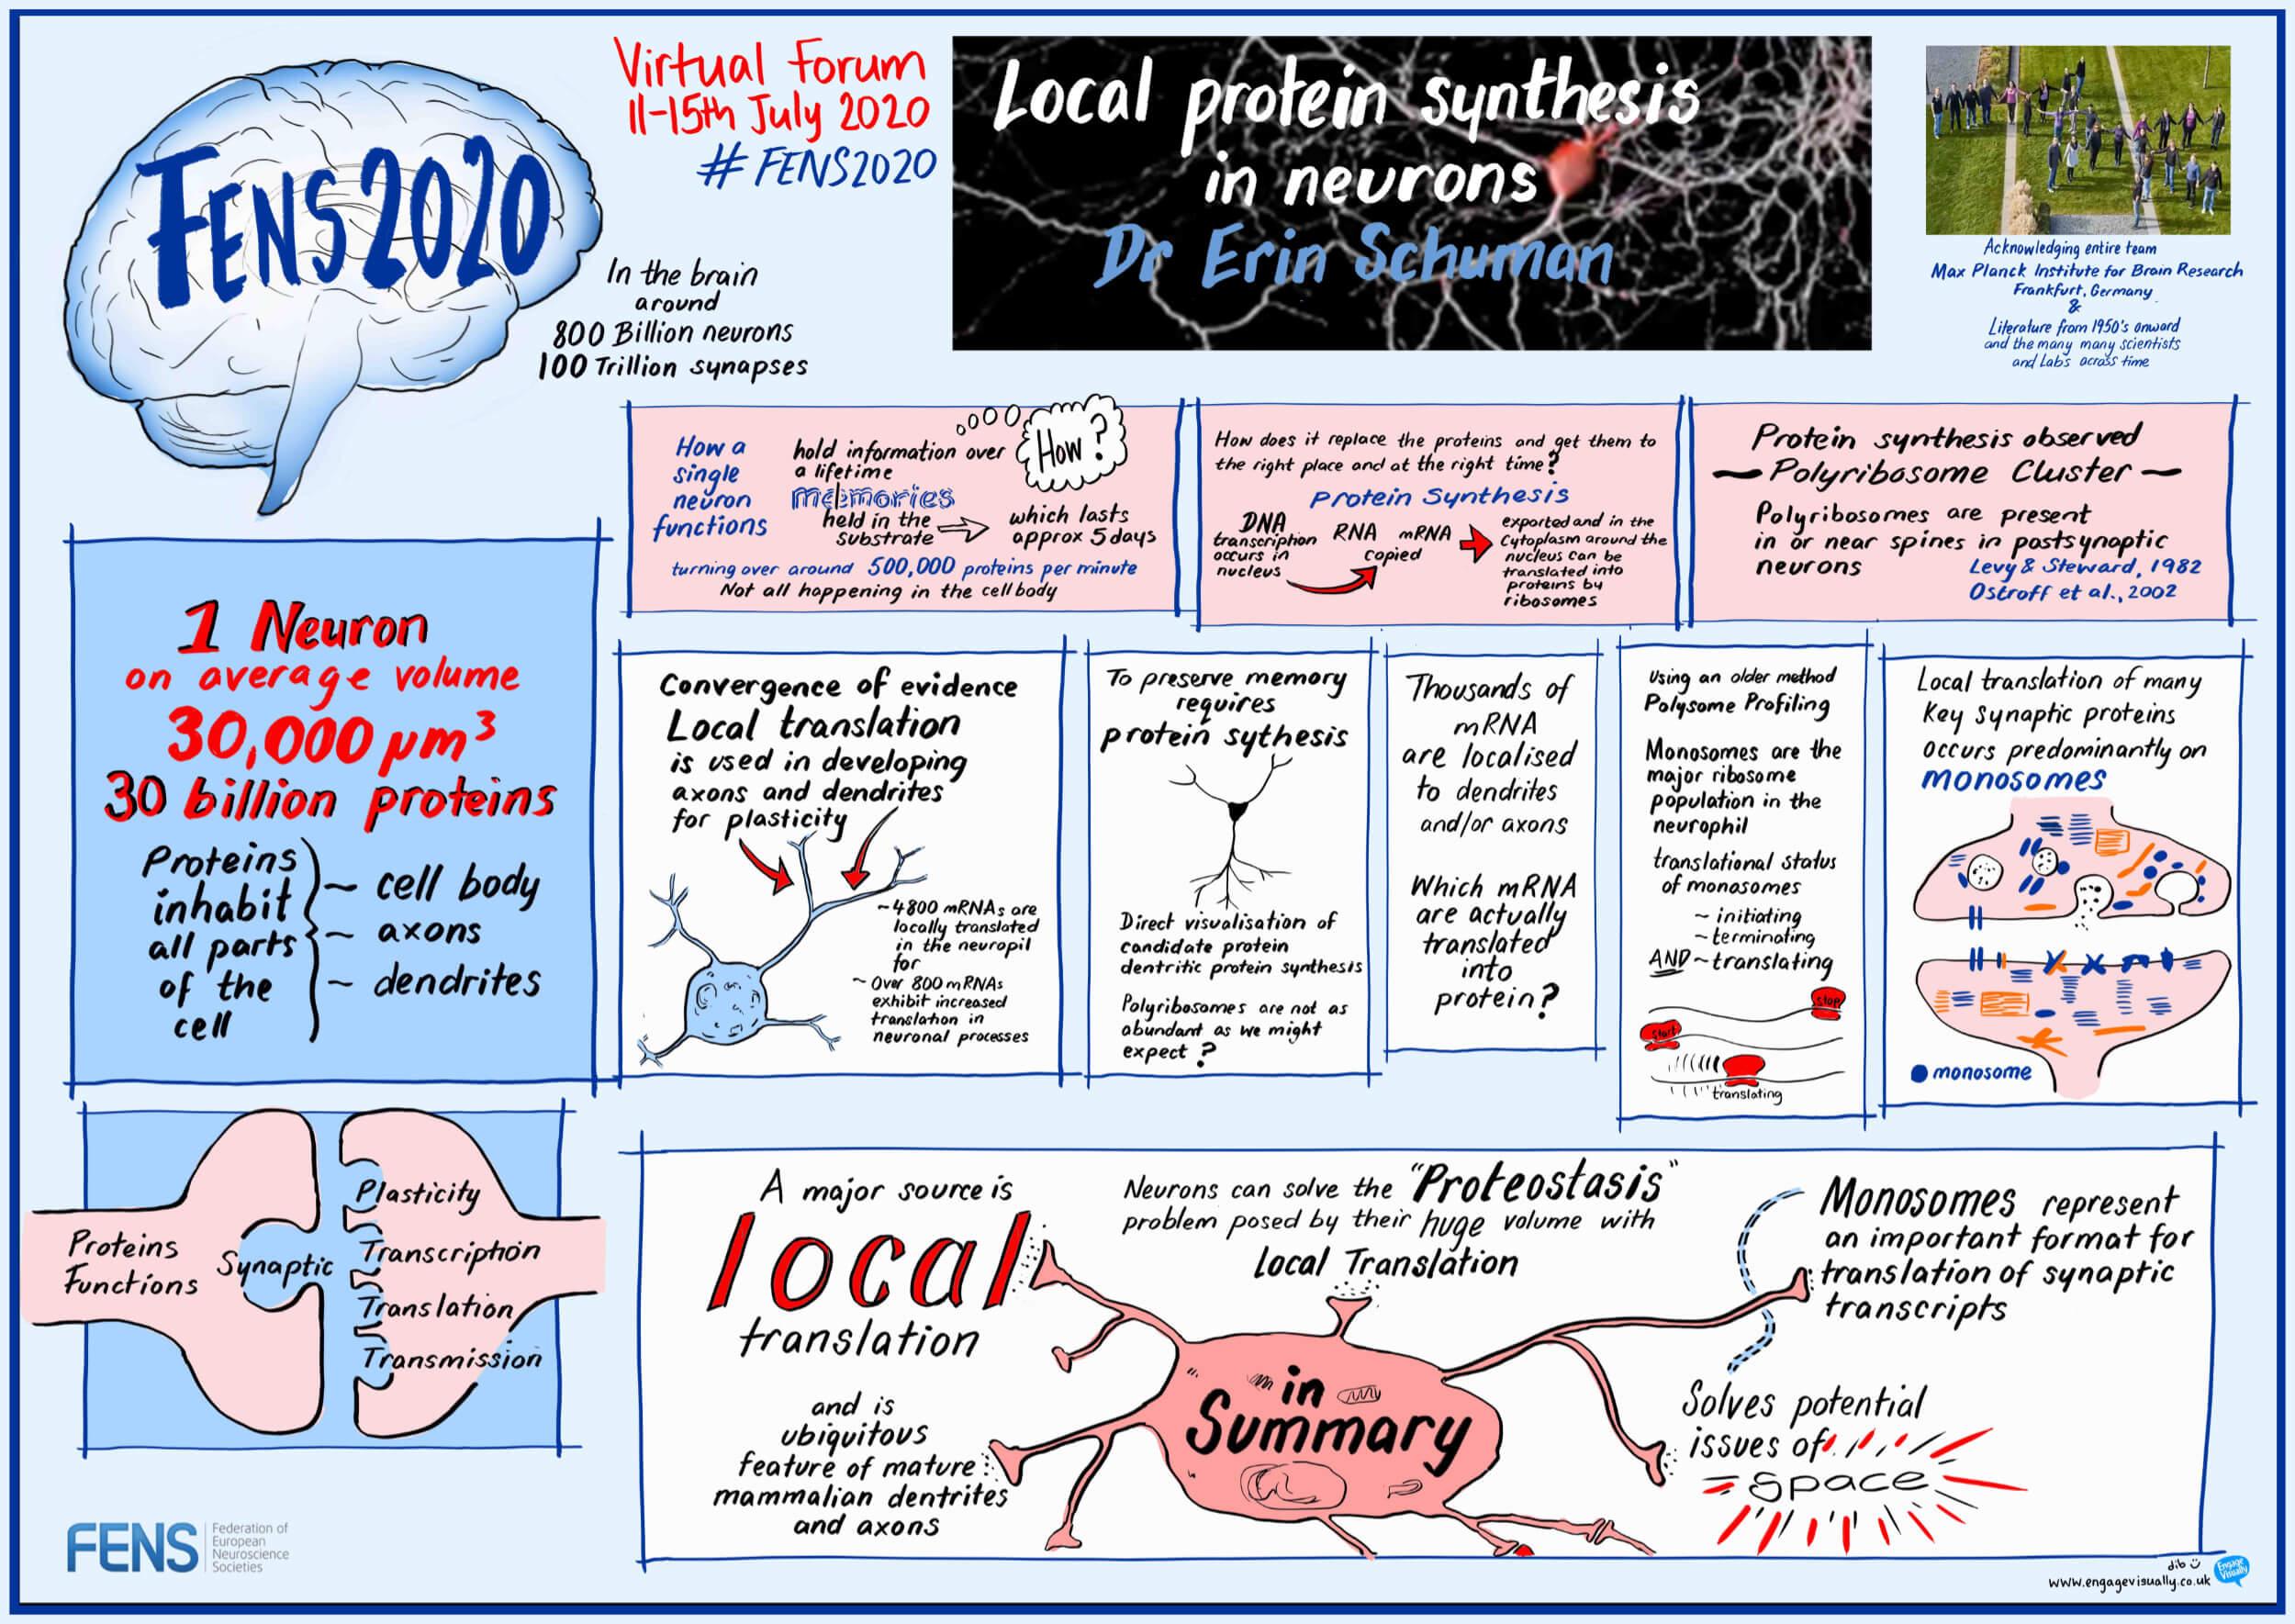 """Local protein synthesis in neurons"" Erin Schuman (DE)"